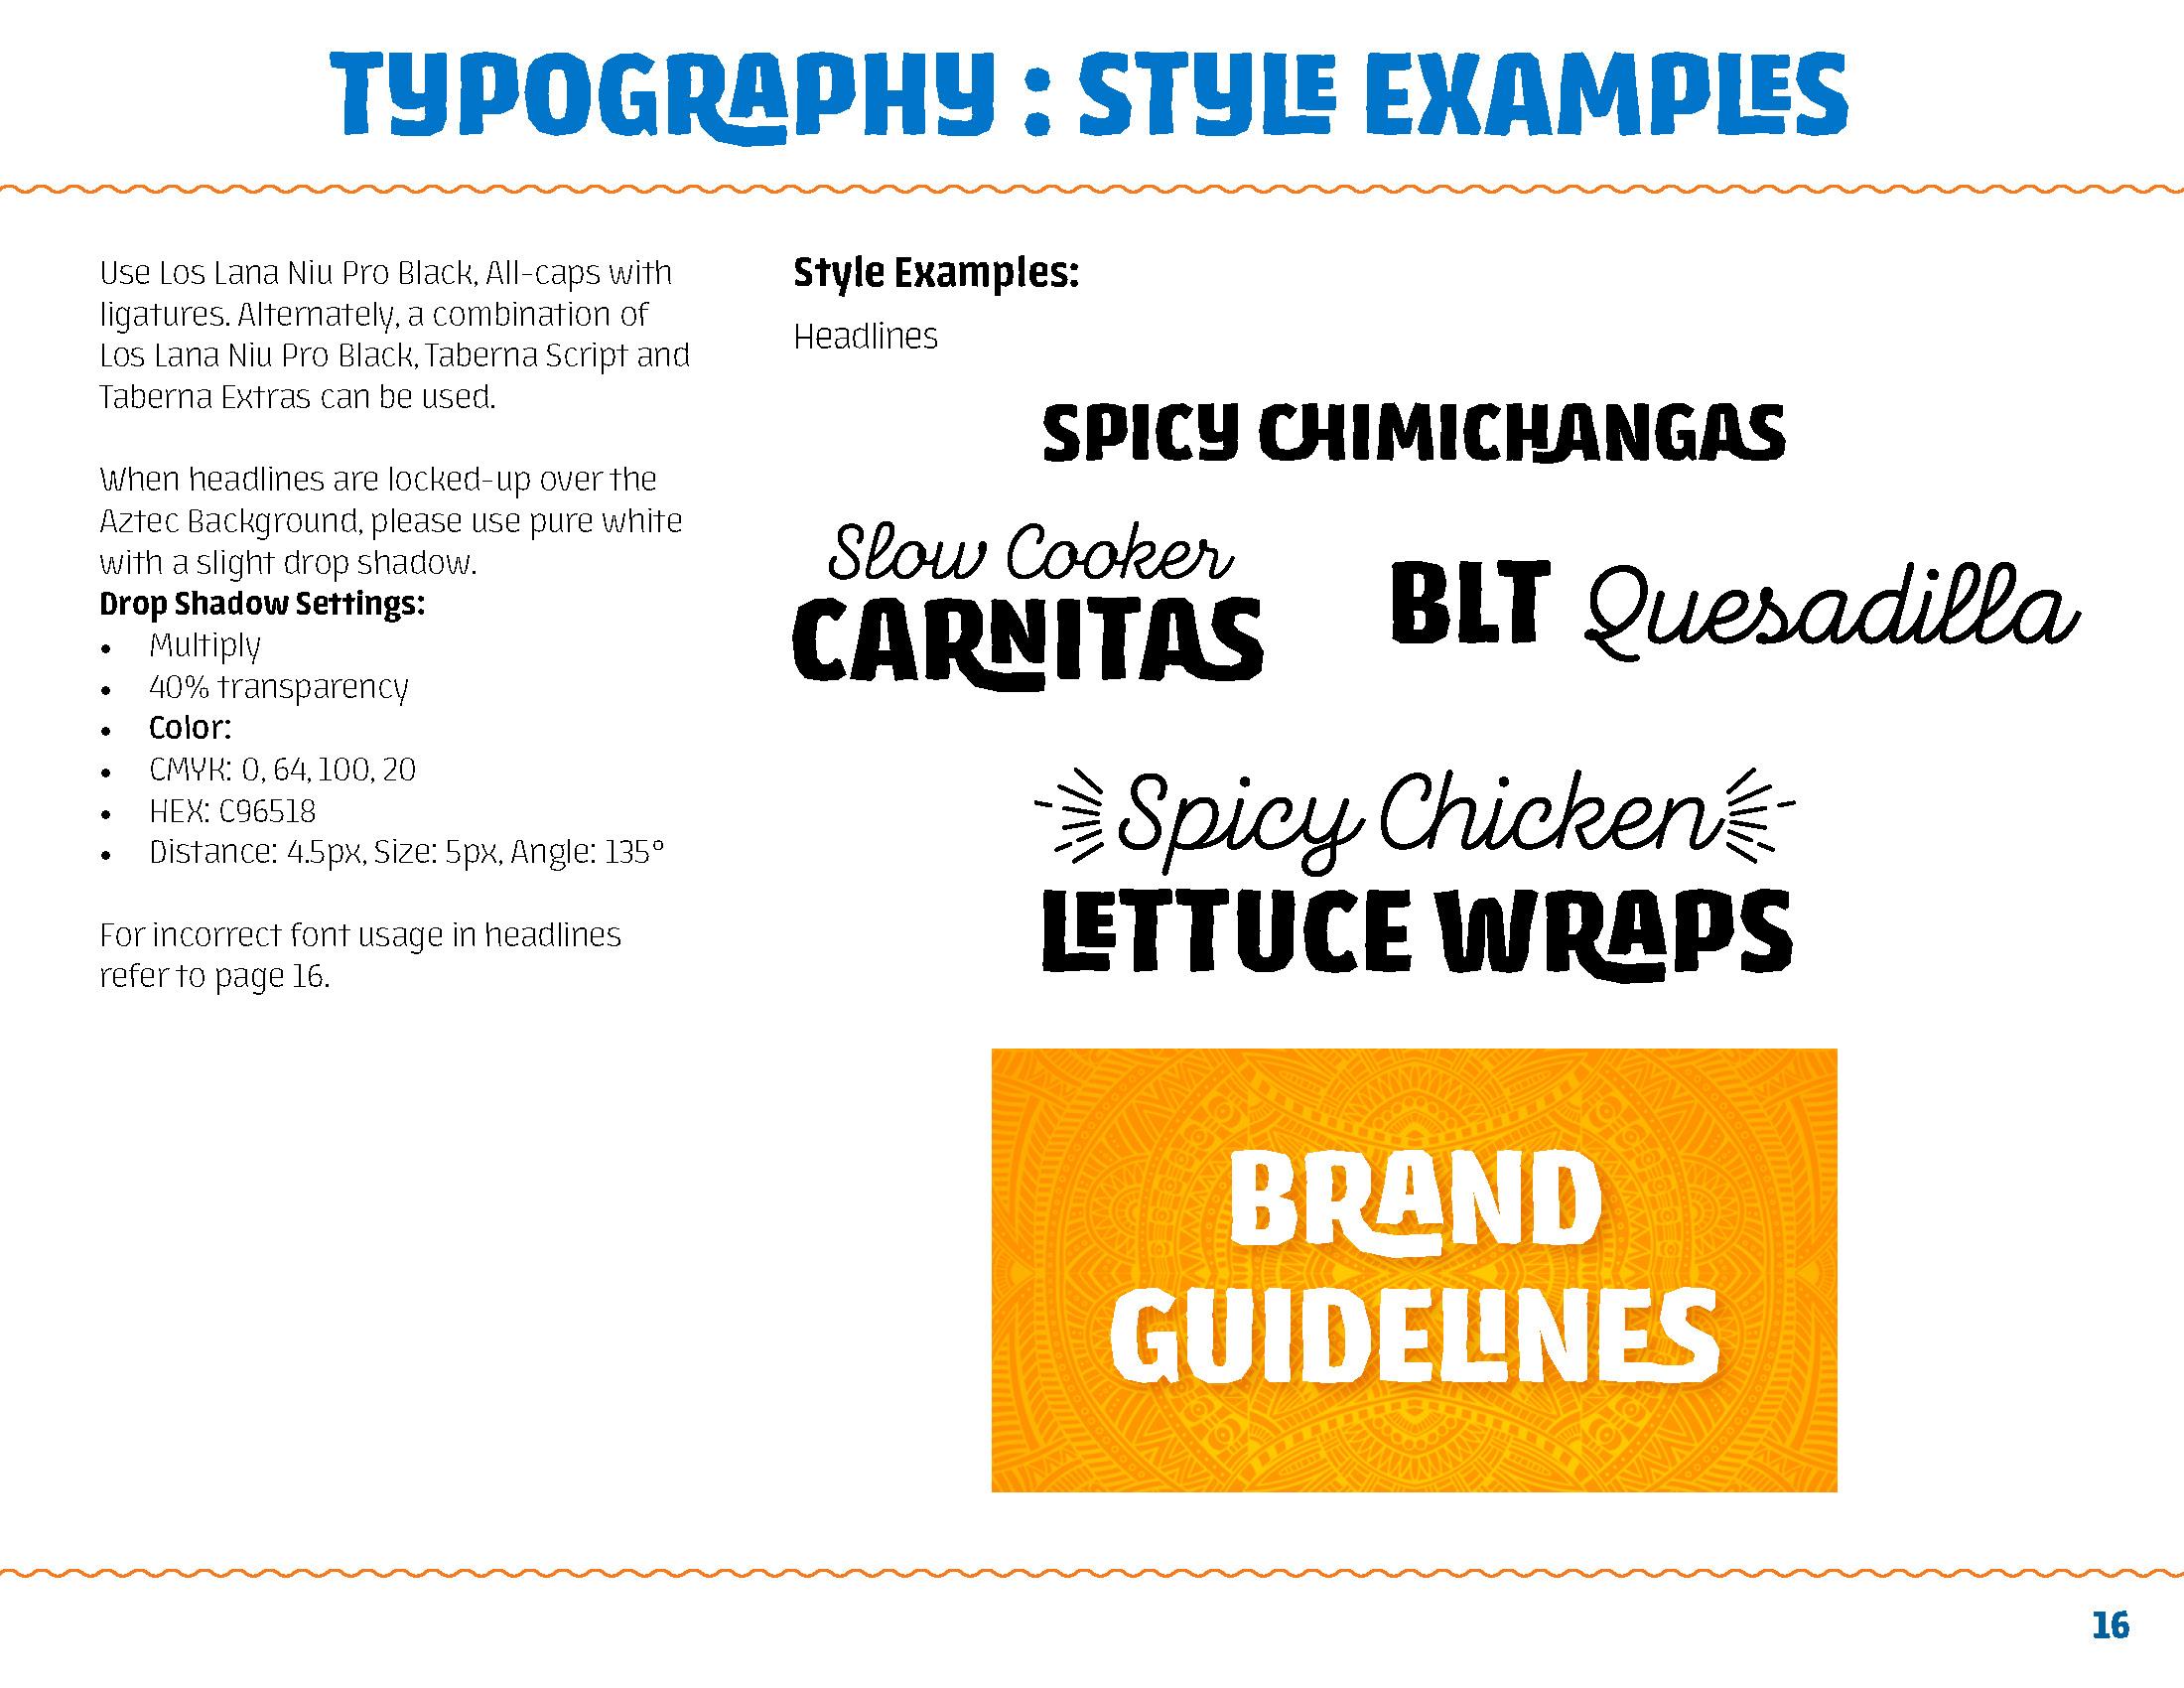 ORTEGA-Brand Guidelines – V1R3_Page_16